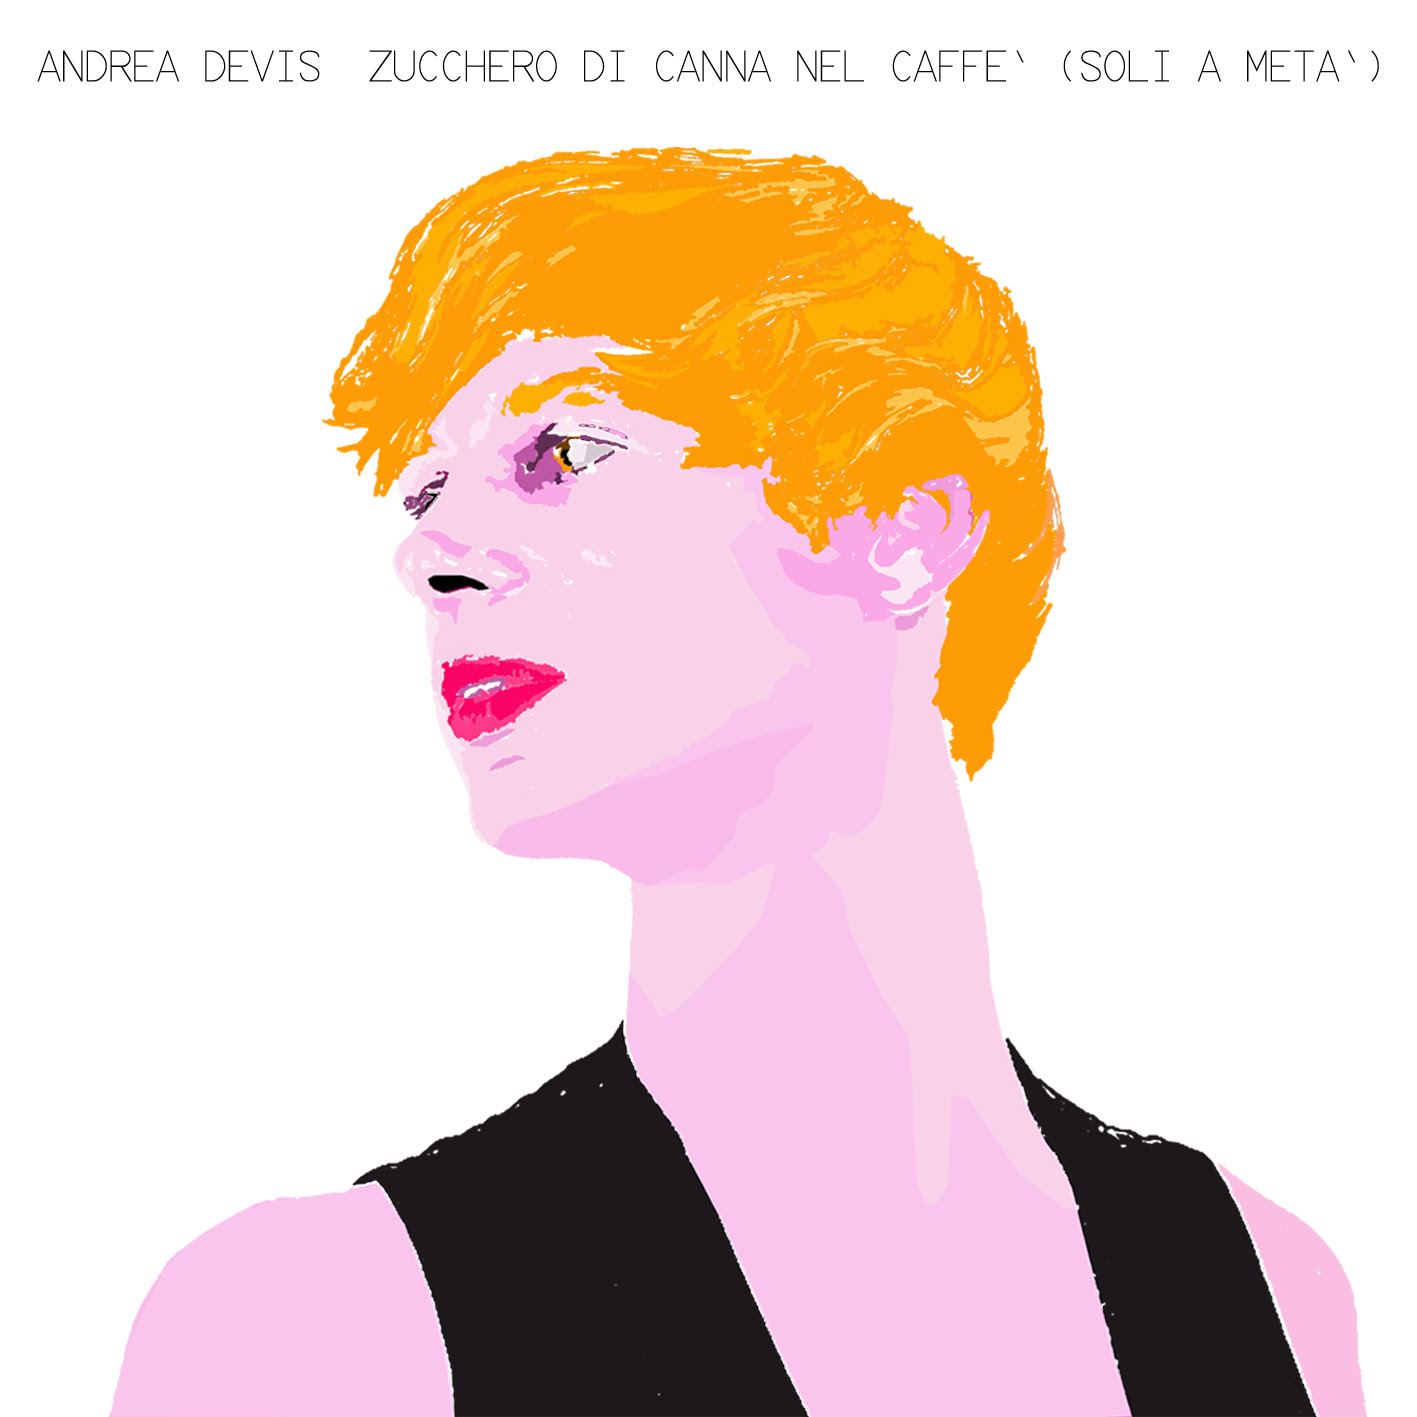 ANDREA DEVIS